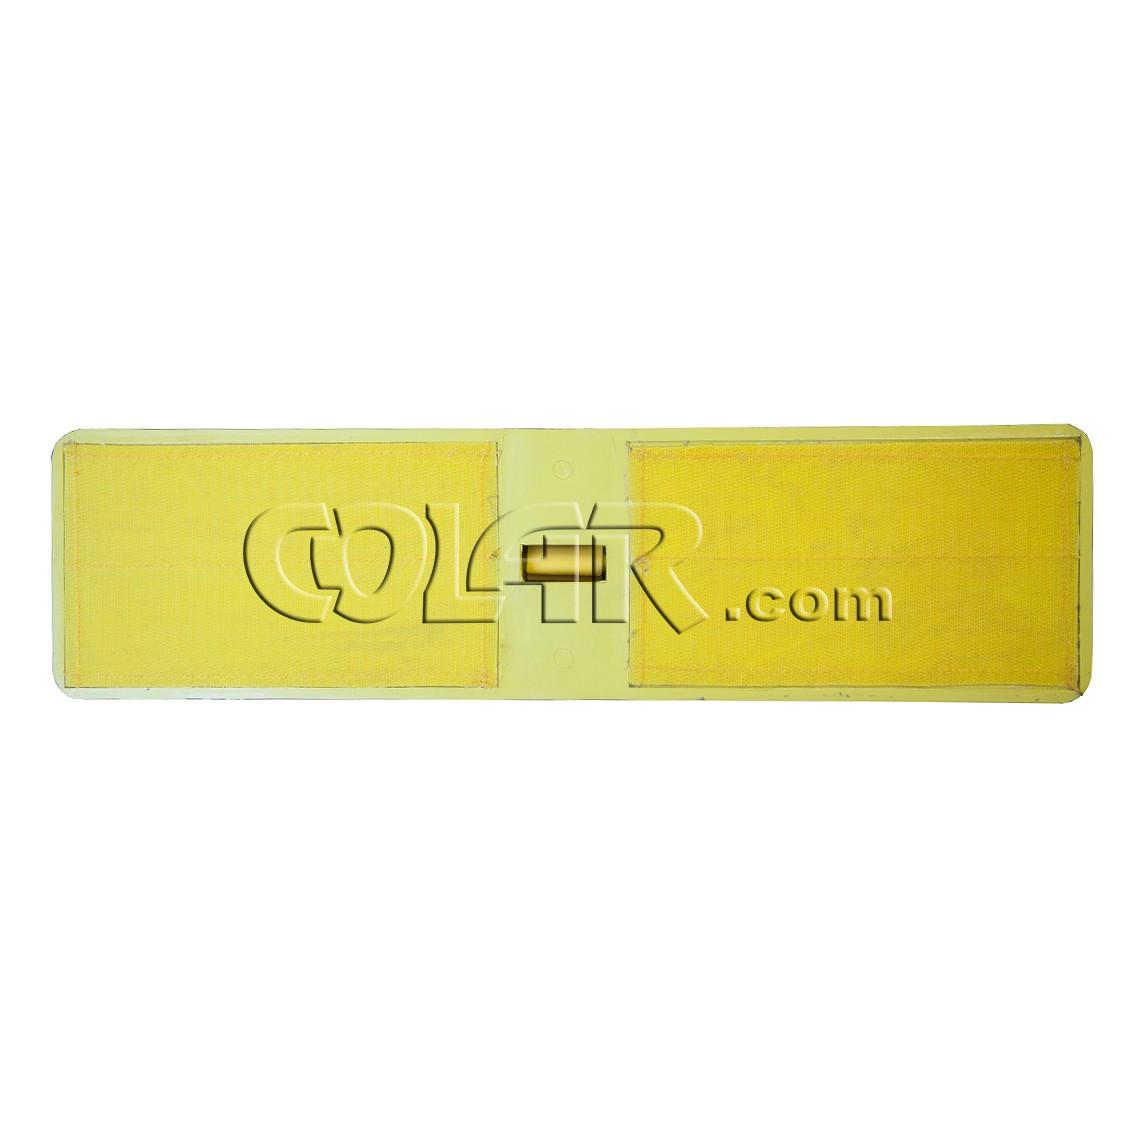 Suporte LT Plastico 45cm Velcro - Amarelo  - COLAR